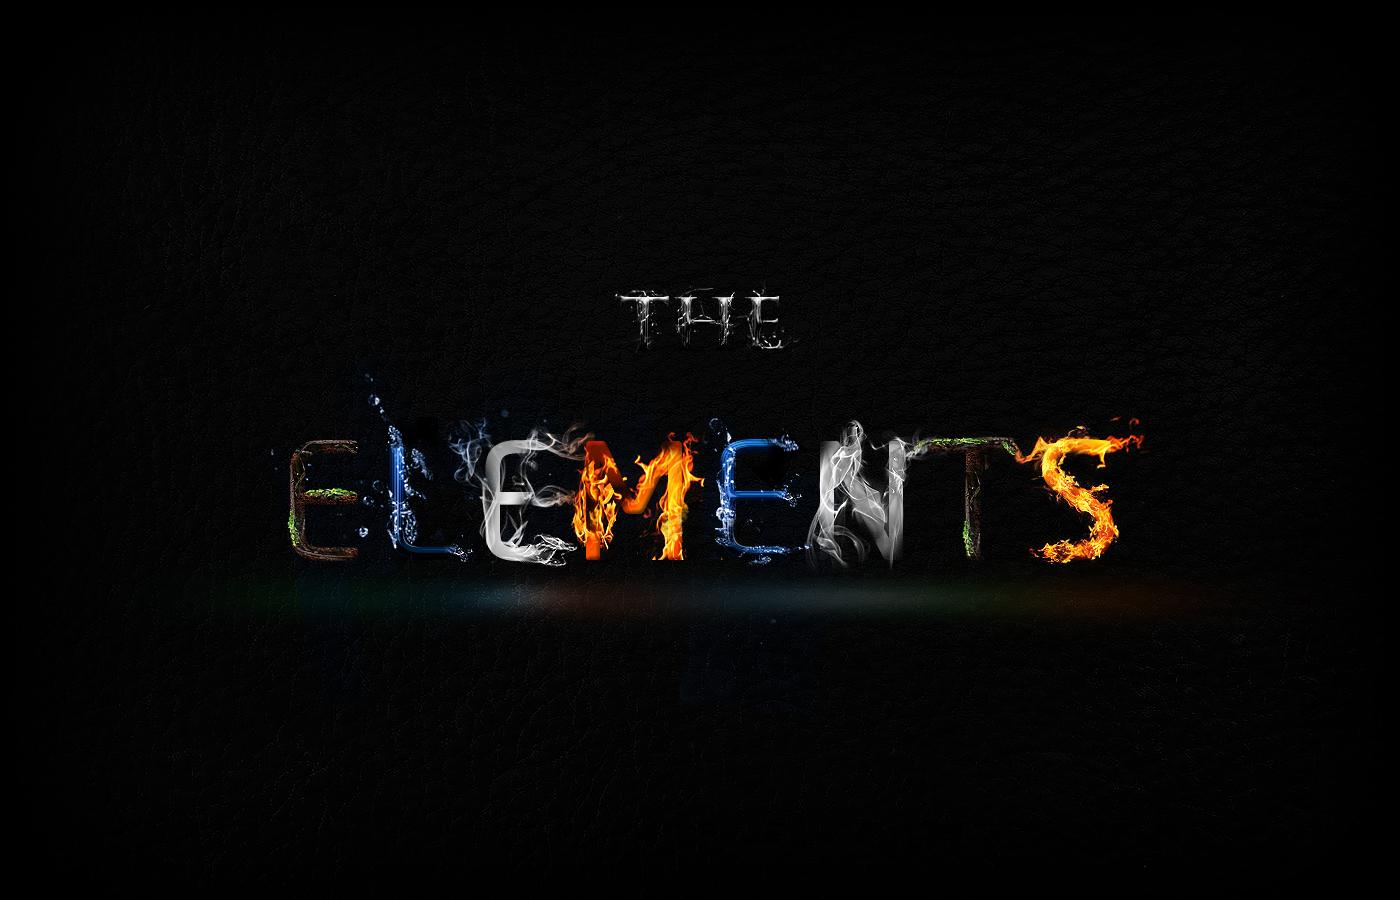 Periodic table black background wallpaper - Elements Wallpaper Wallpapersafari